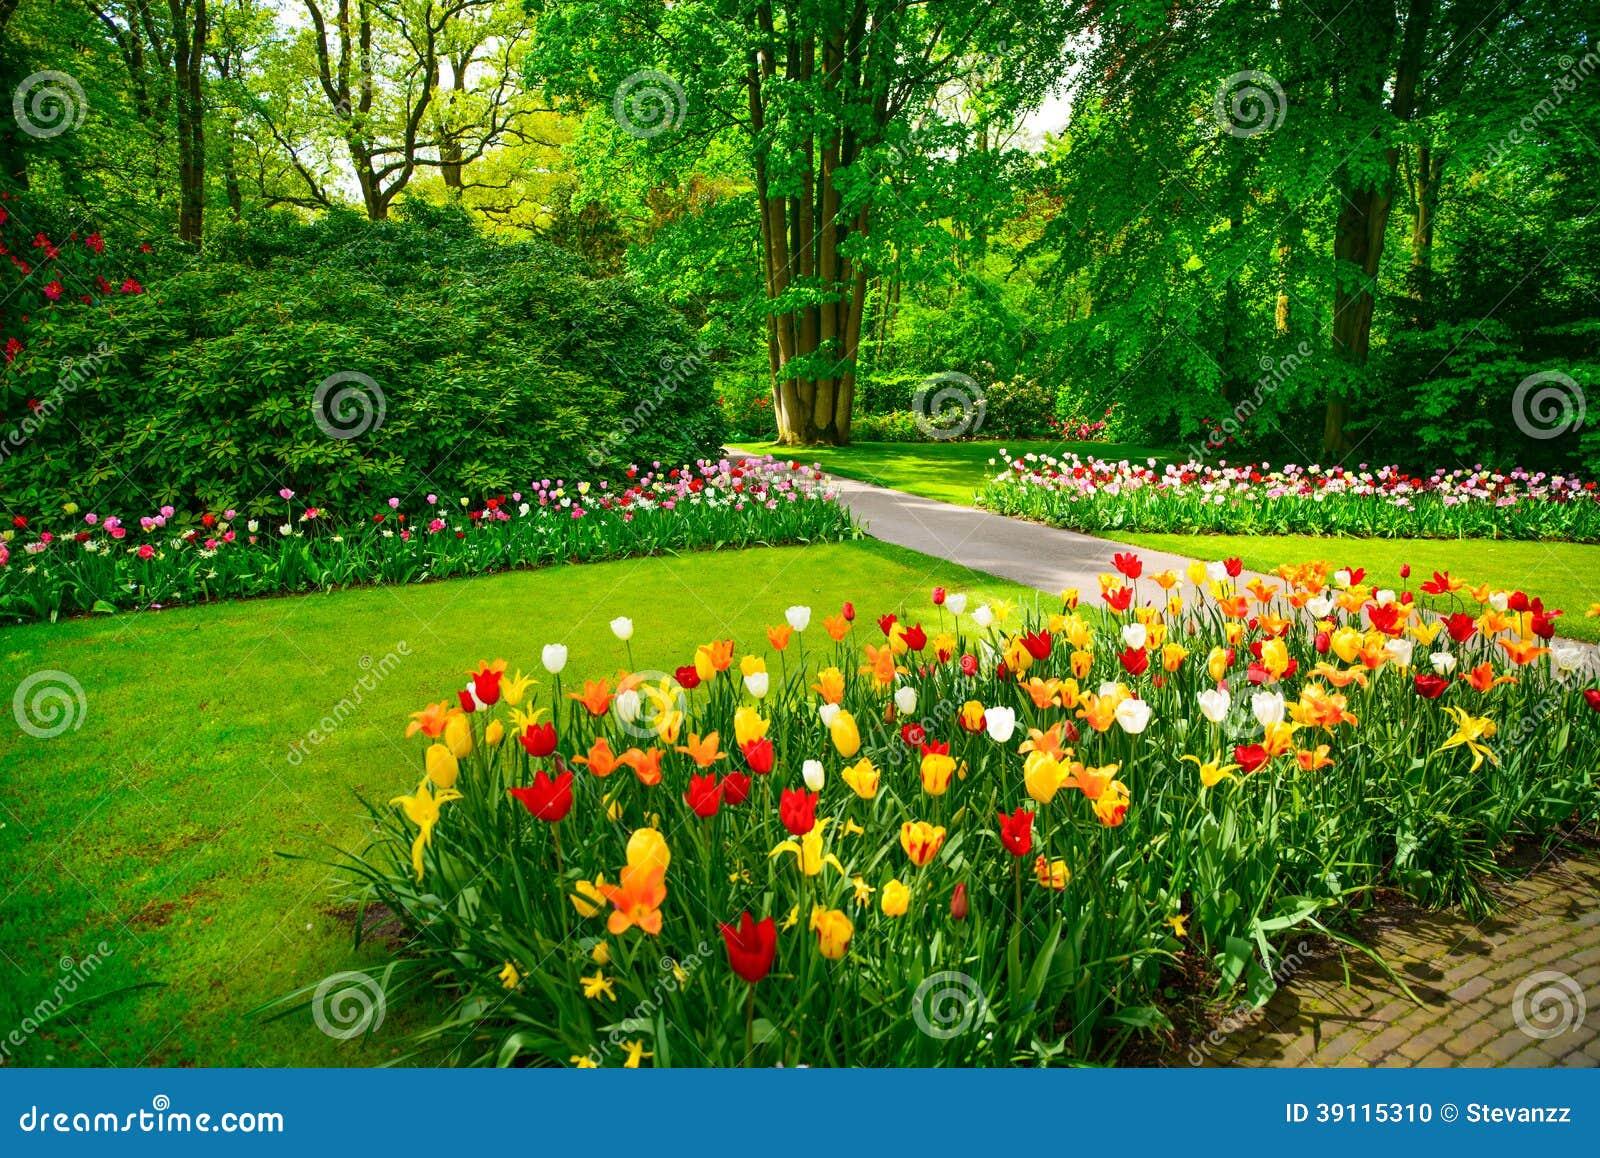 Garden in keukenhof tulip flowers netherlands stock - Jardines con rosas ...